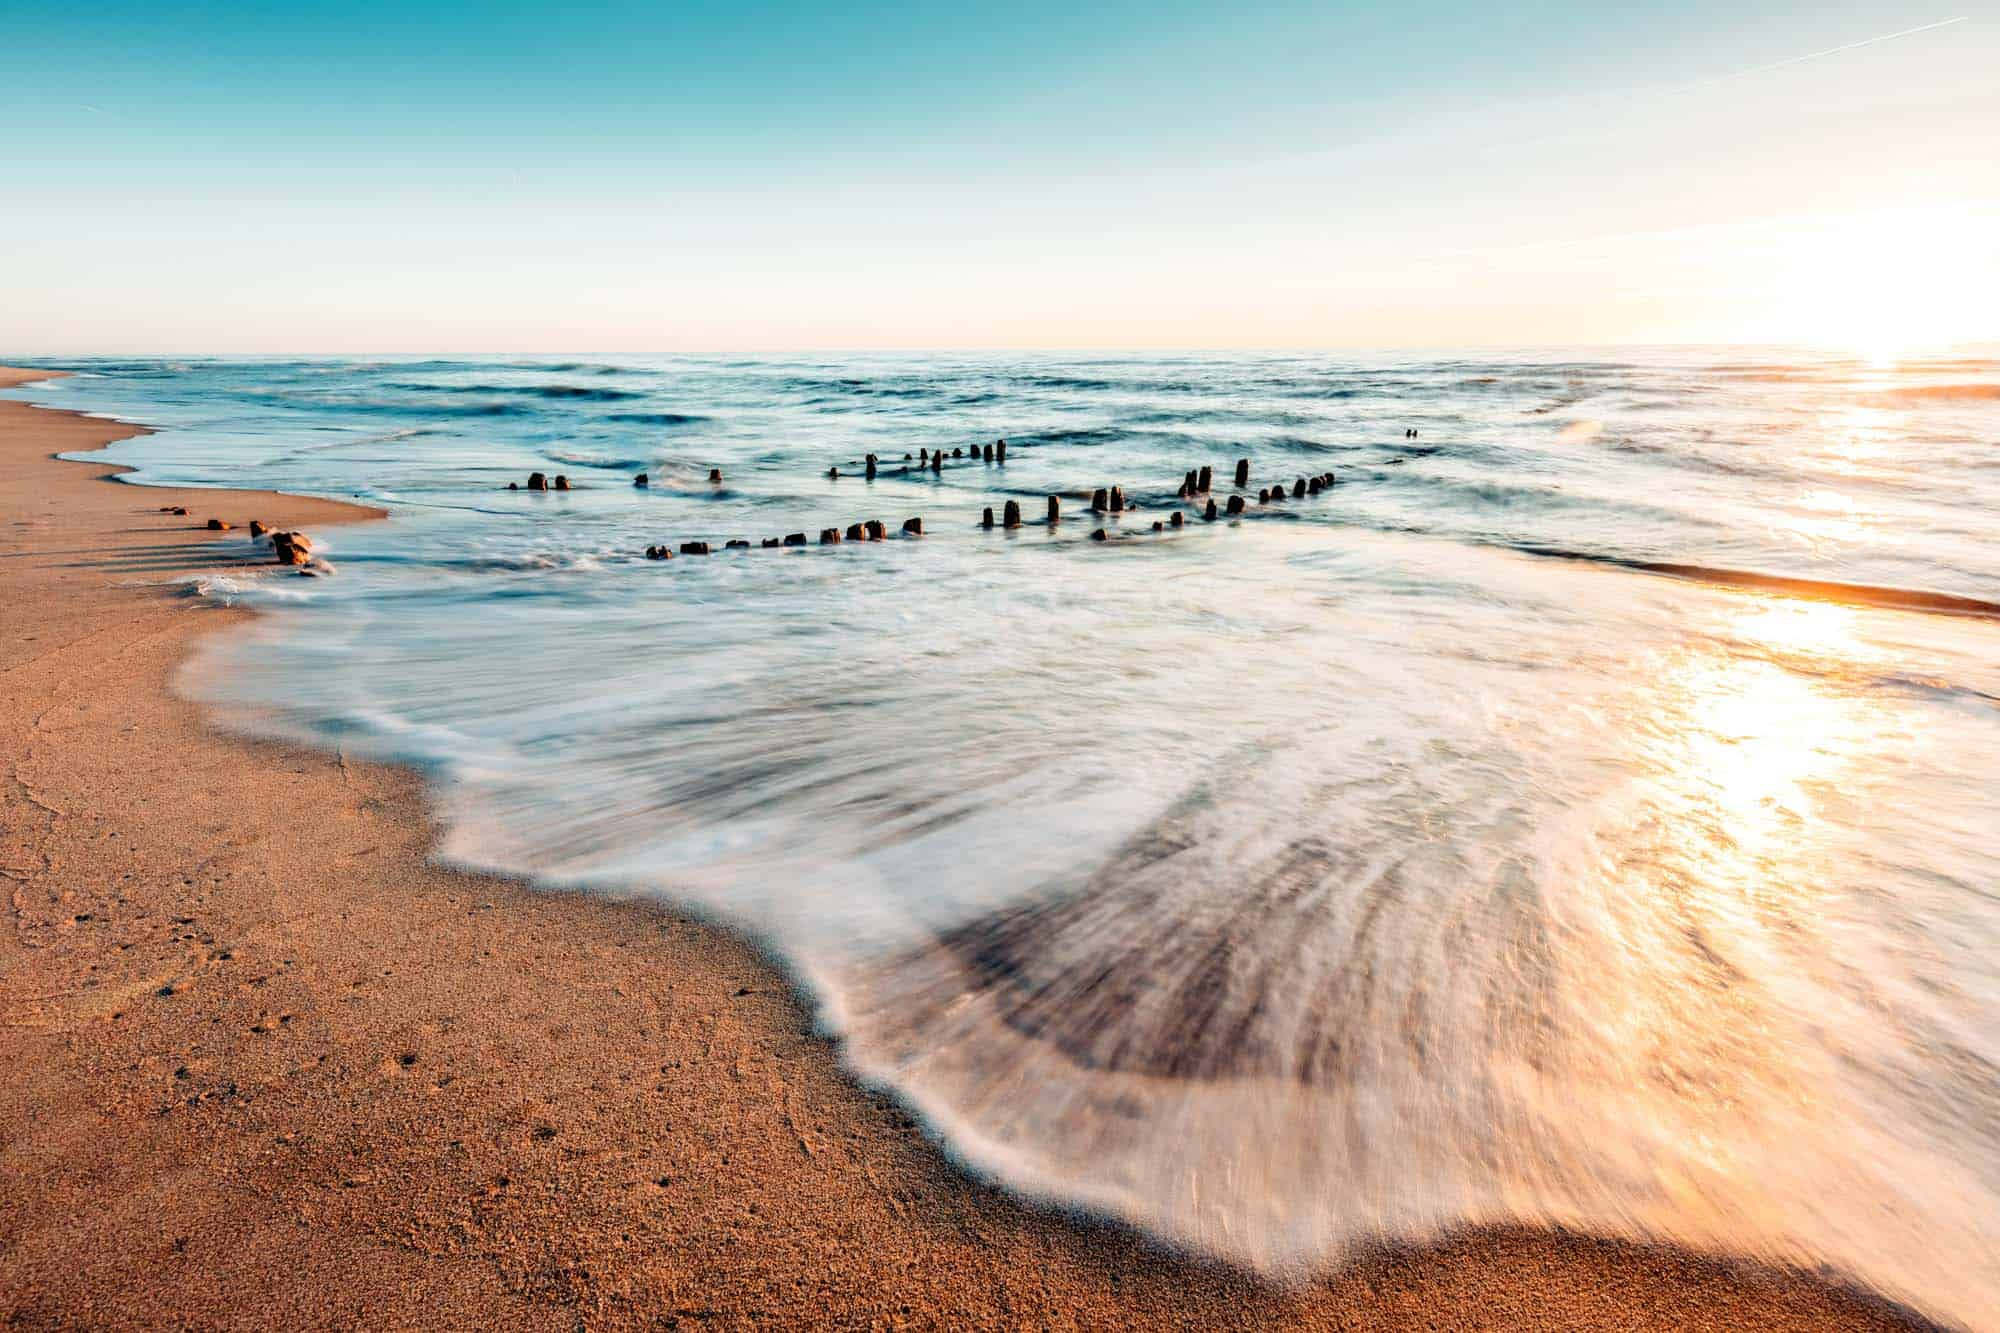 Strand nordsee sonnenuntergang  Nauke Jaschinski Photography | Sylt Fotograf Nordsee Landschaft ...